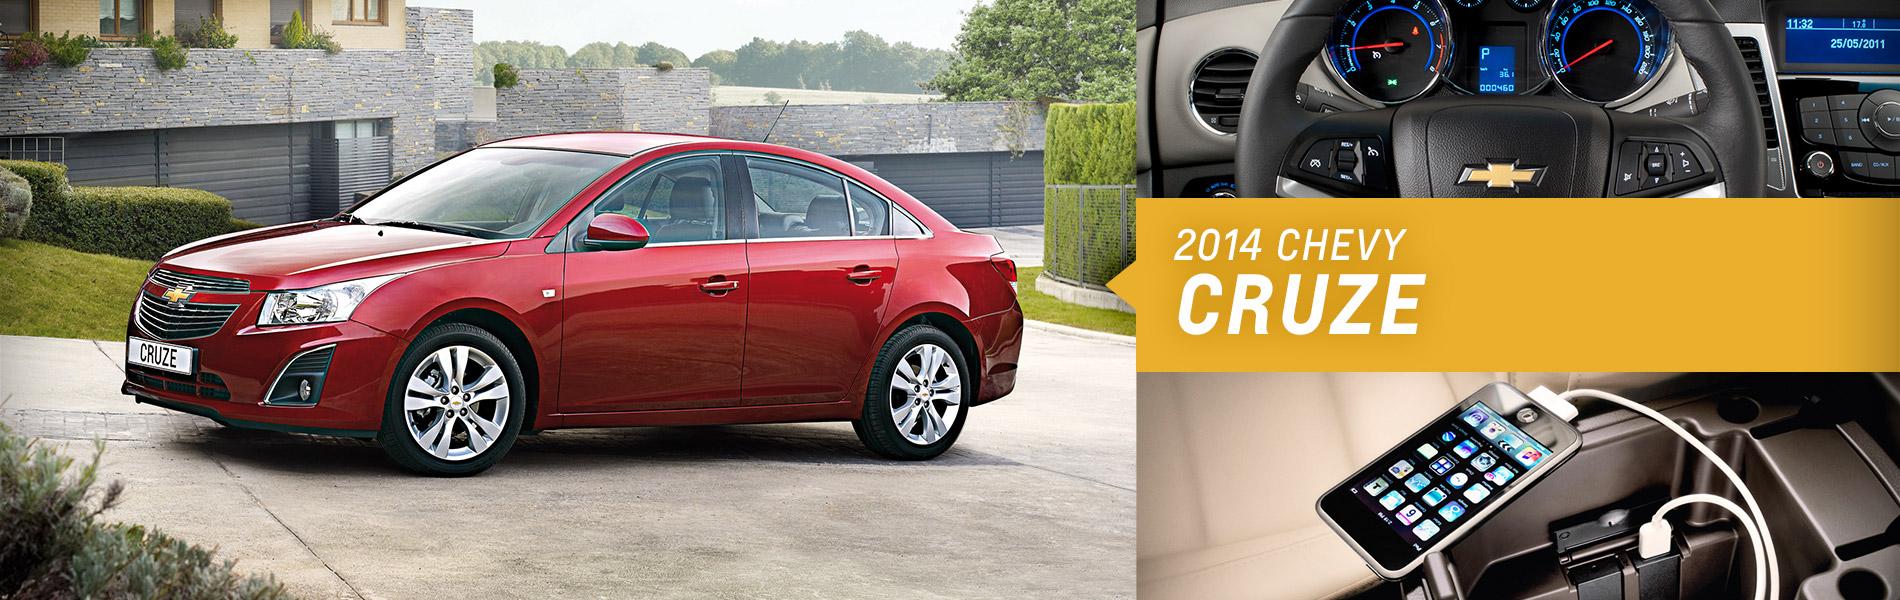 2014 Chevrolet Cruze Casey Auto Newport News Va